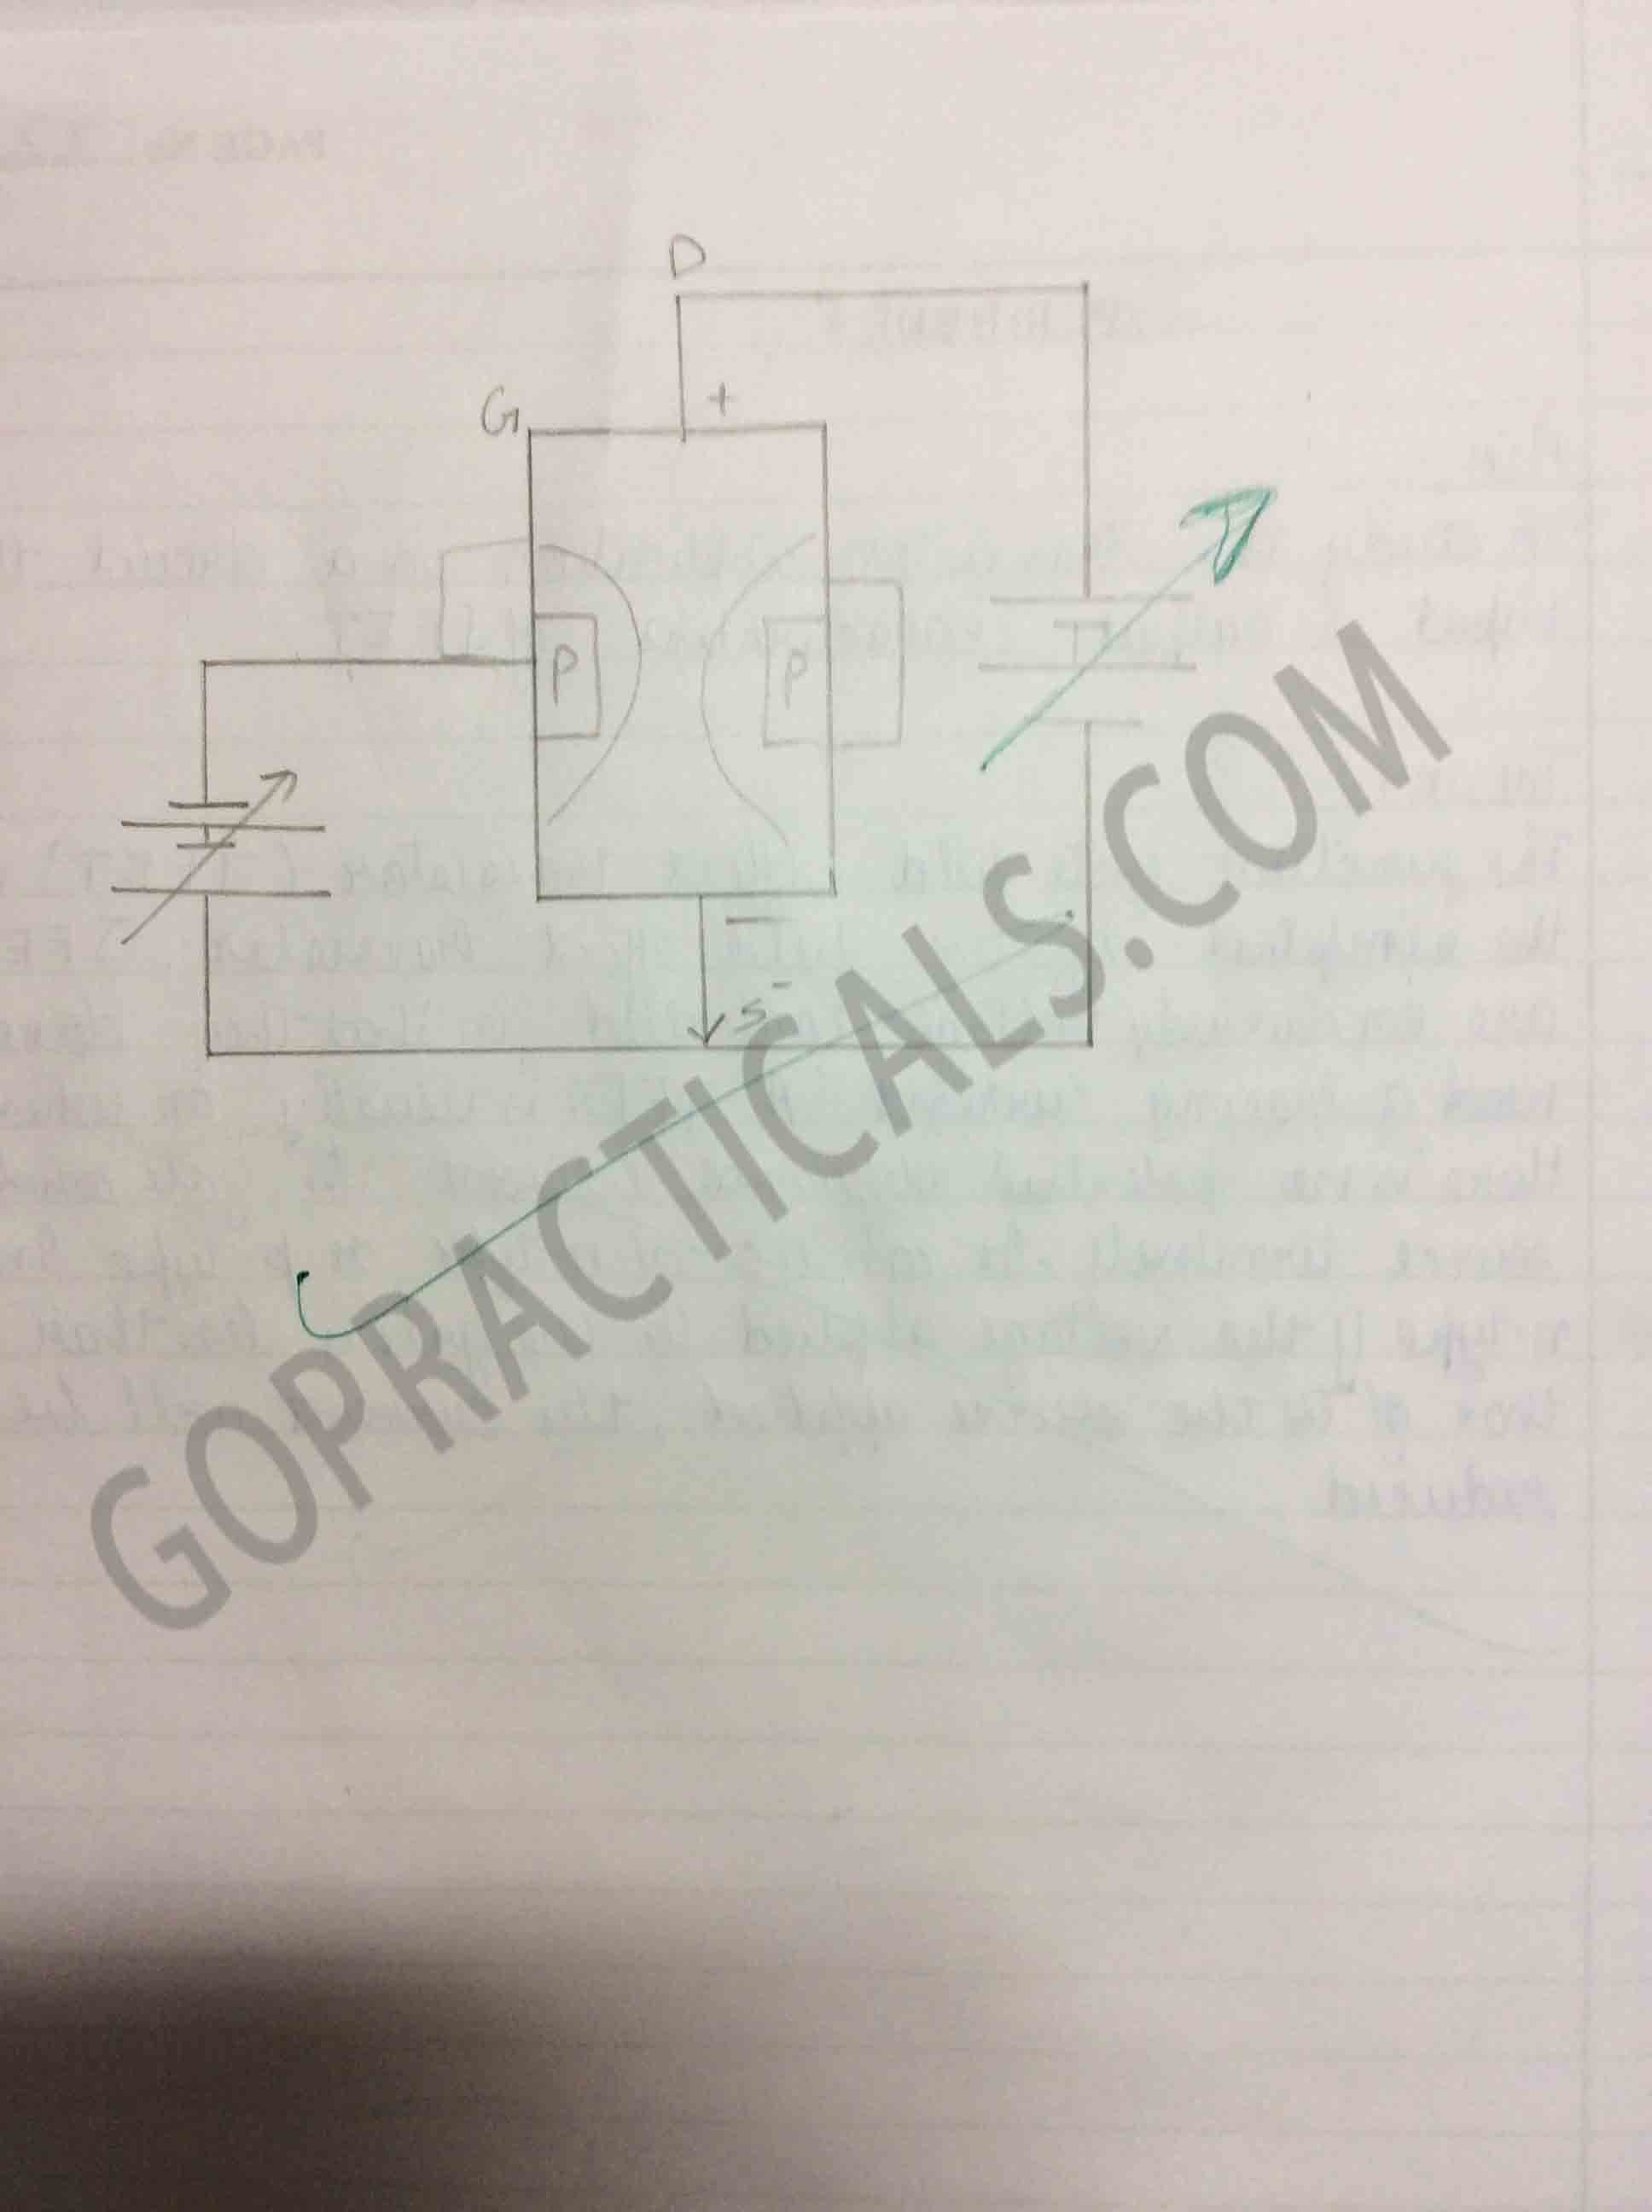 study Transistor Input/Output Characteristics of JFET-4